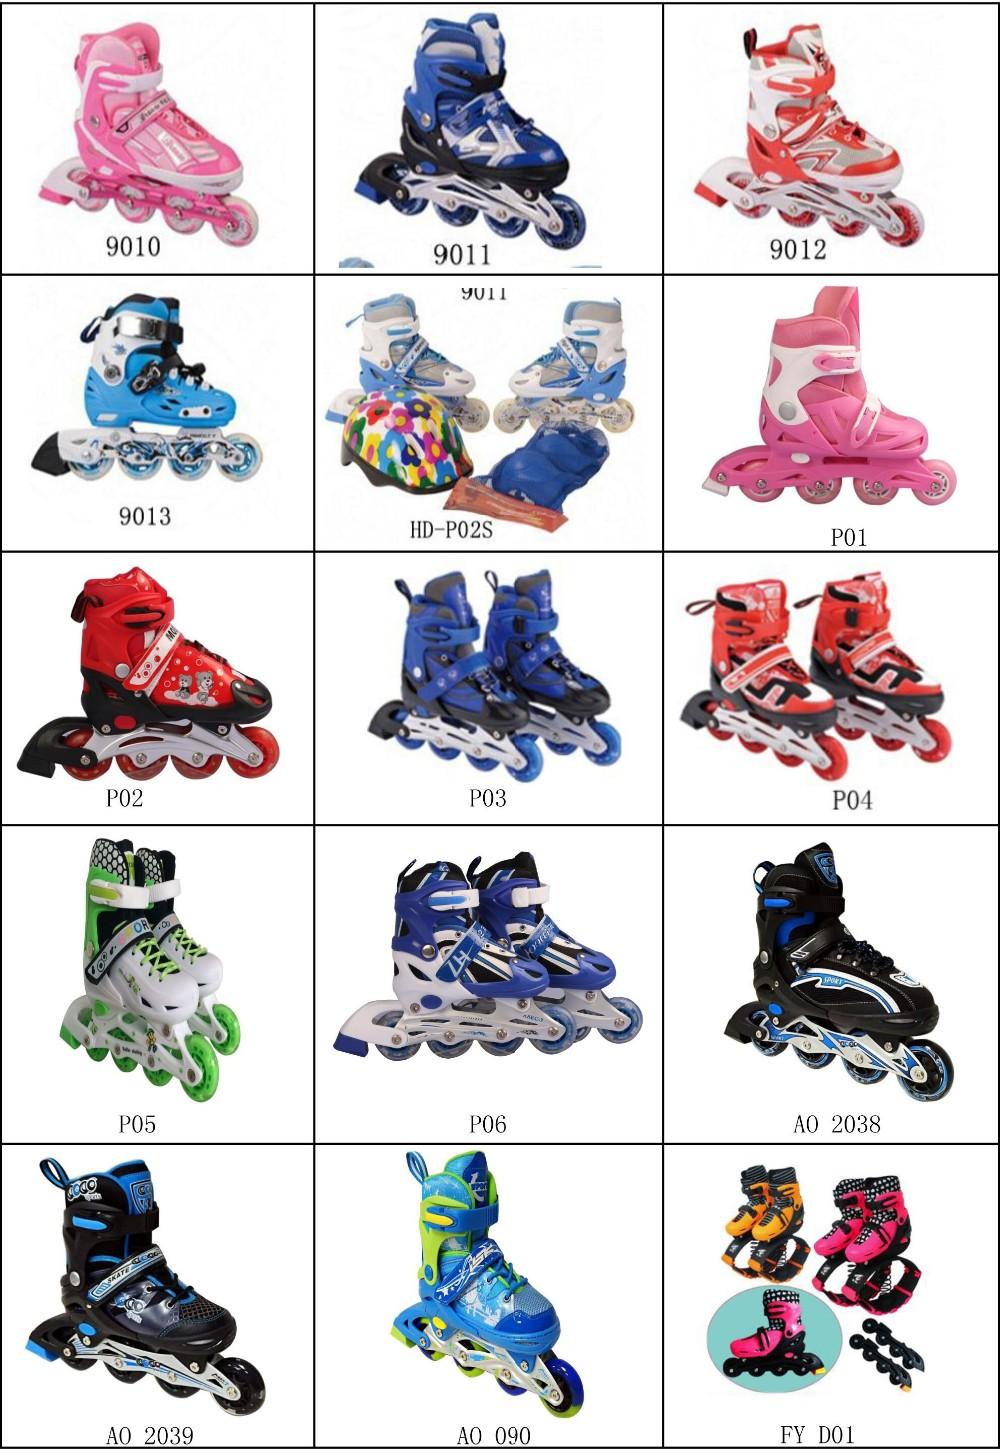 Kids Roller Design For Land Direct Roller New on Roller Retractable Shoes Roller Sports Shoes Product Shoes Skates Skate Skate Skate Skate Adult Buy 29EDIH